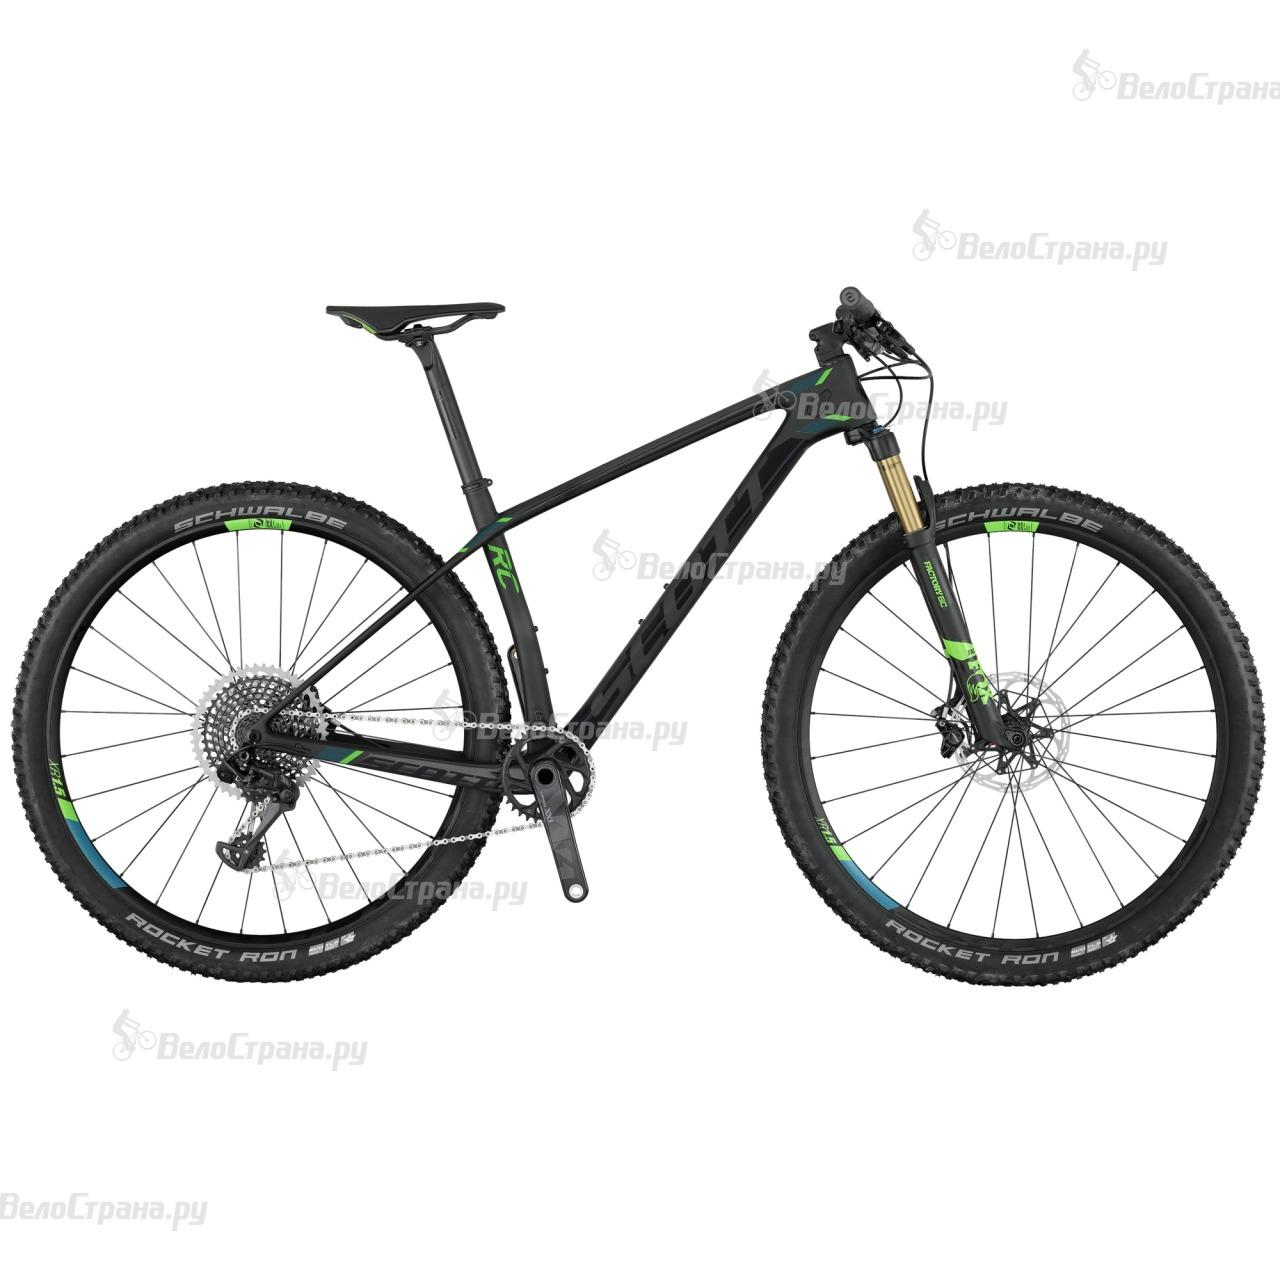 Велосипед Scott Scale RC 700 Ultimate (2017)